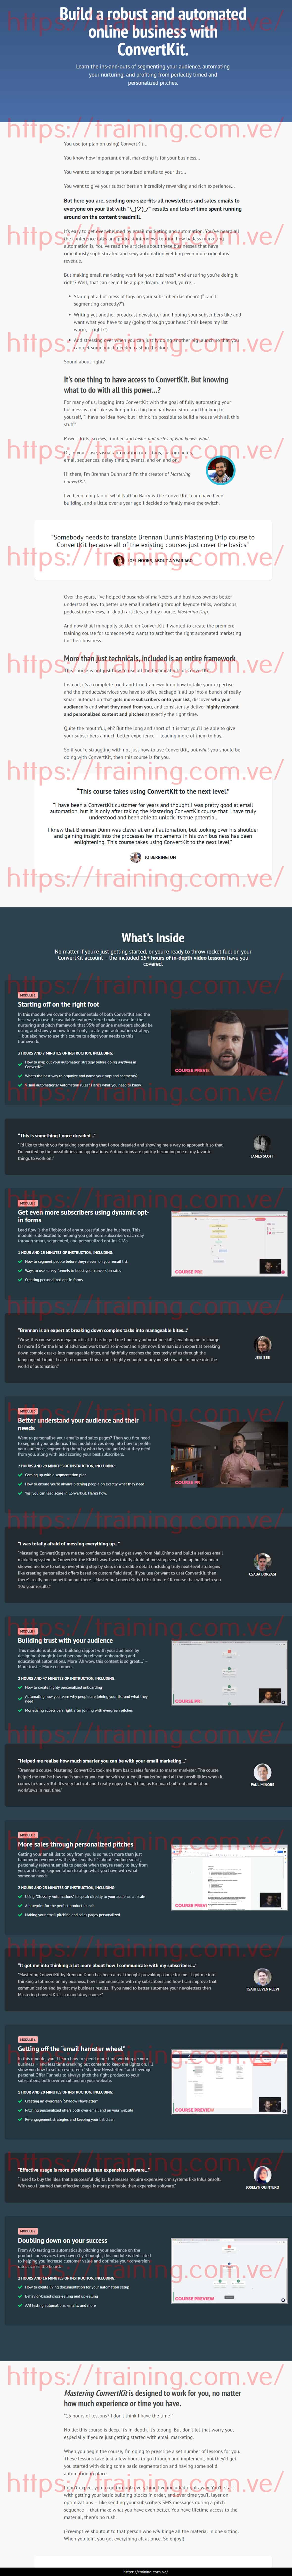 Mastering ConvertKit by Brennan Dunn Sales Page